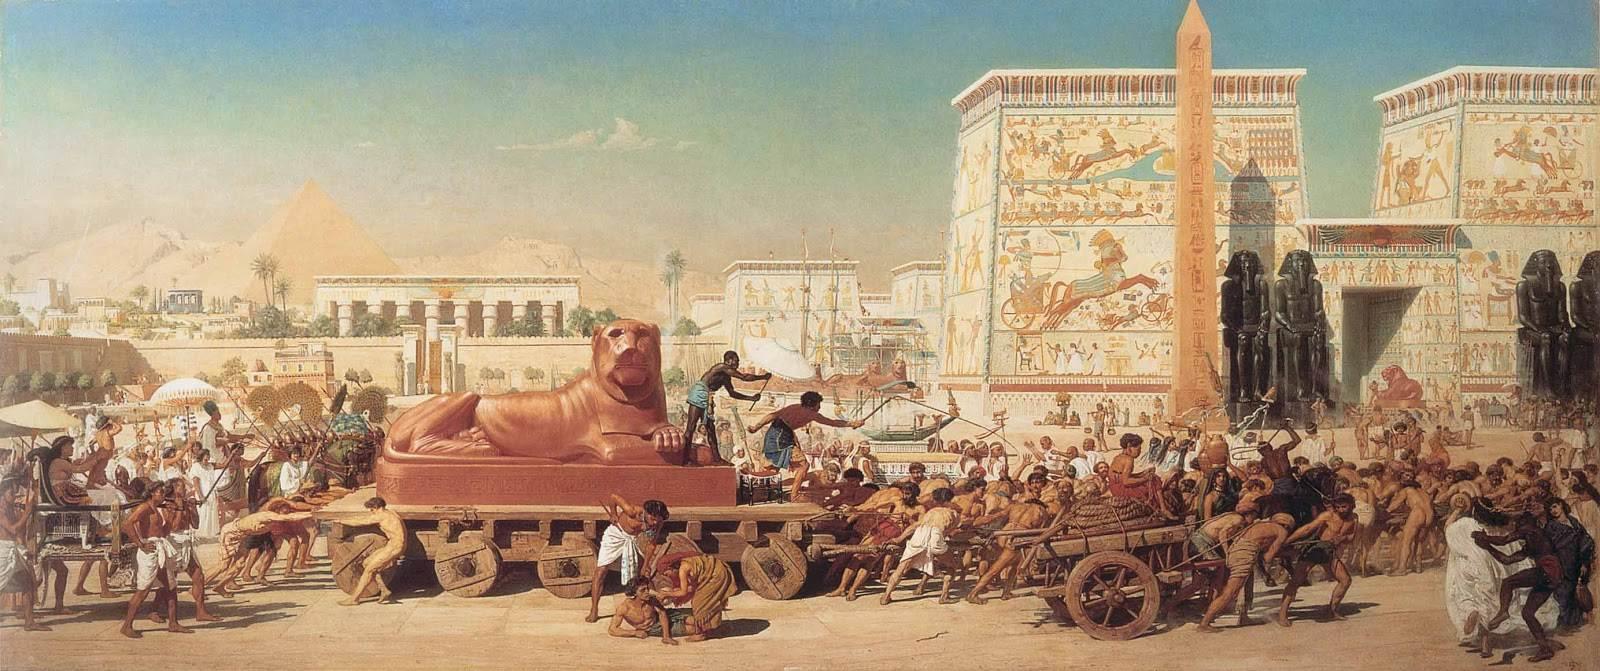 general-antiguo-egipto